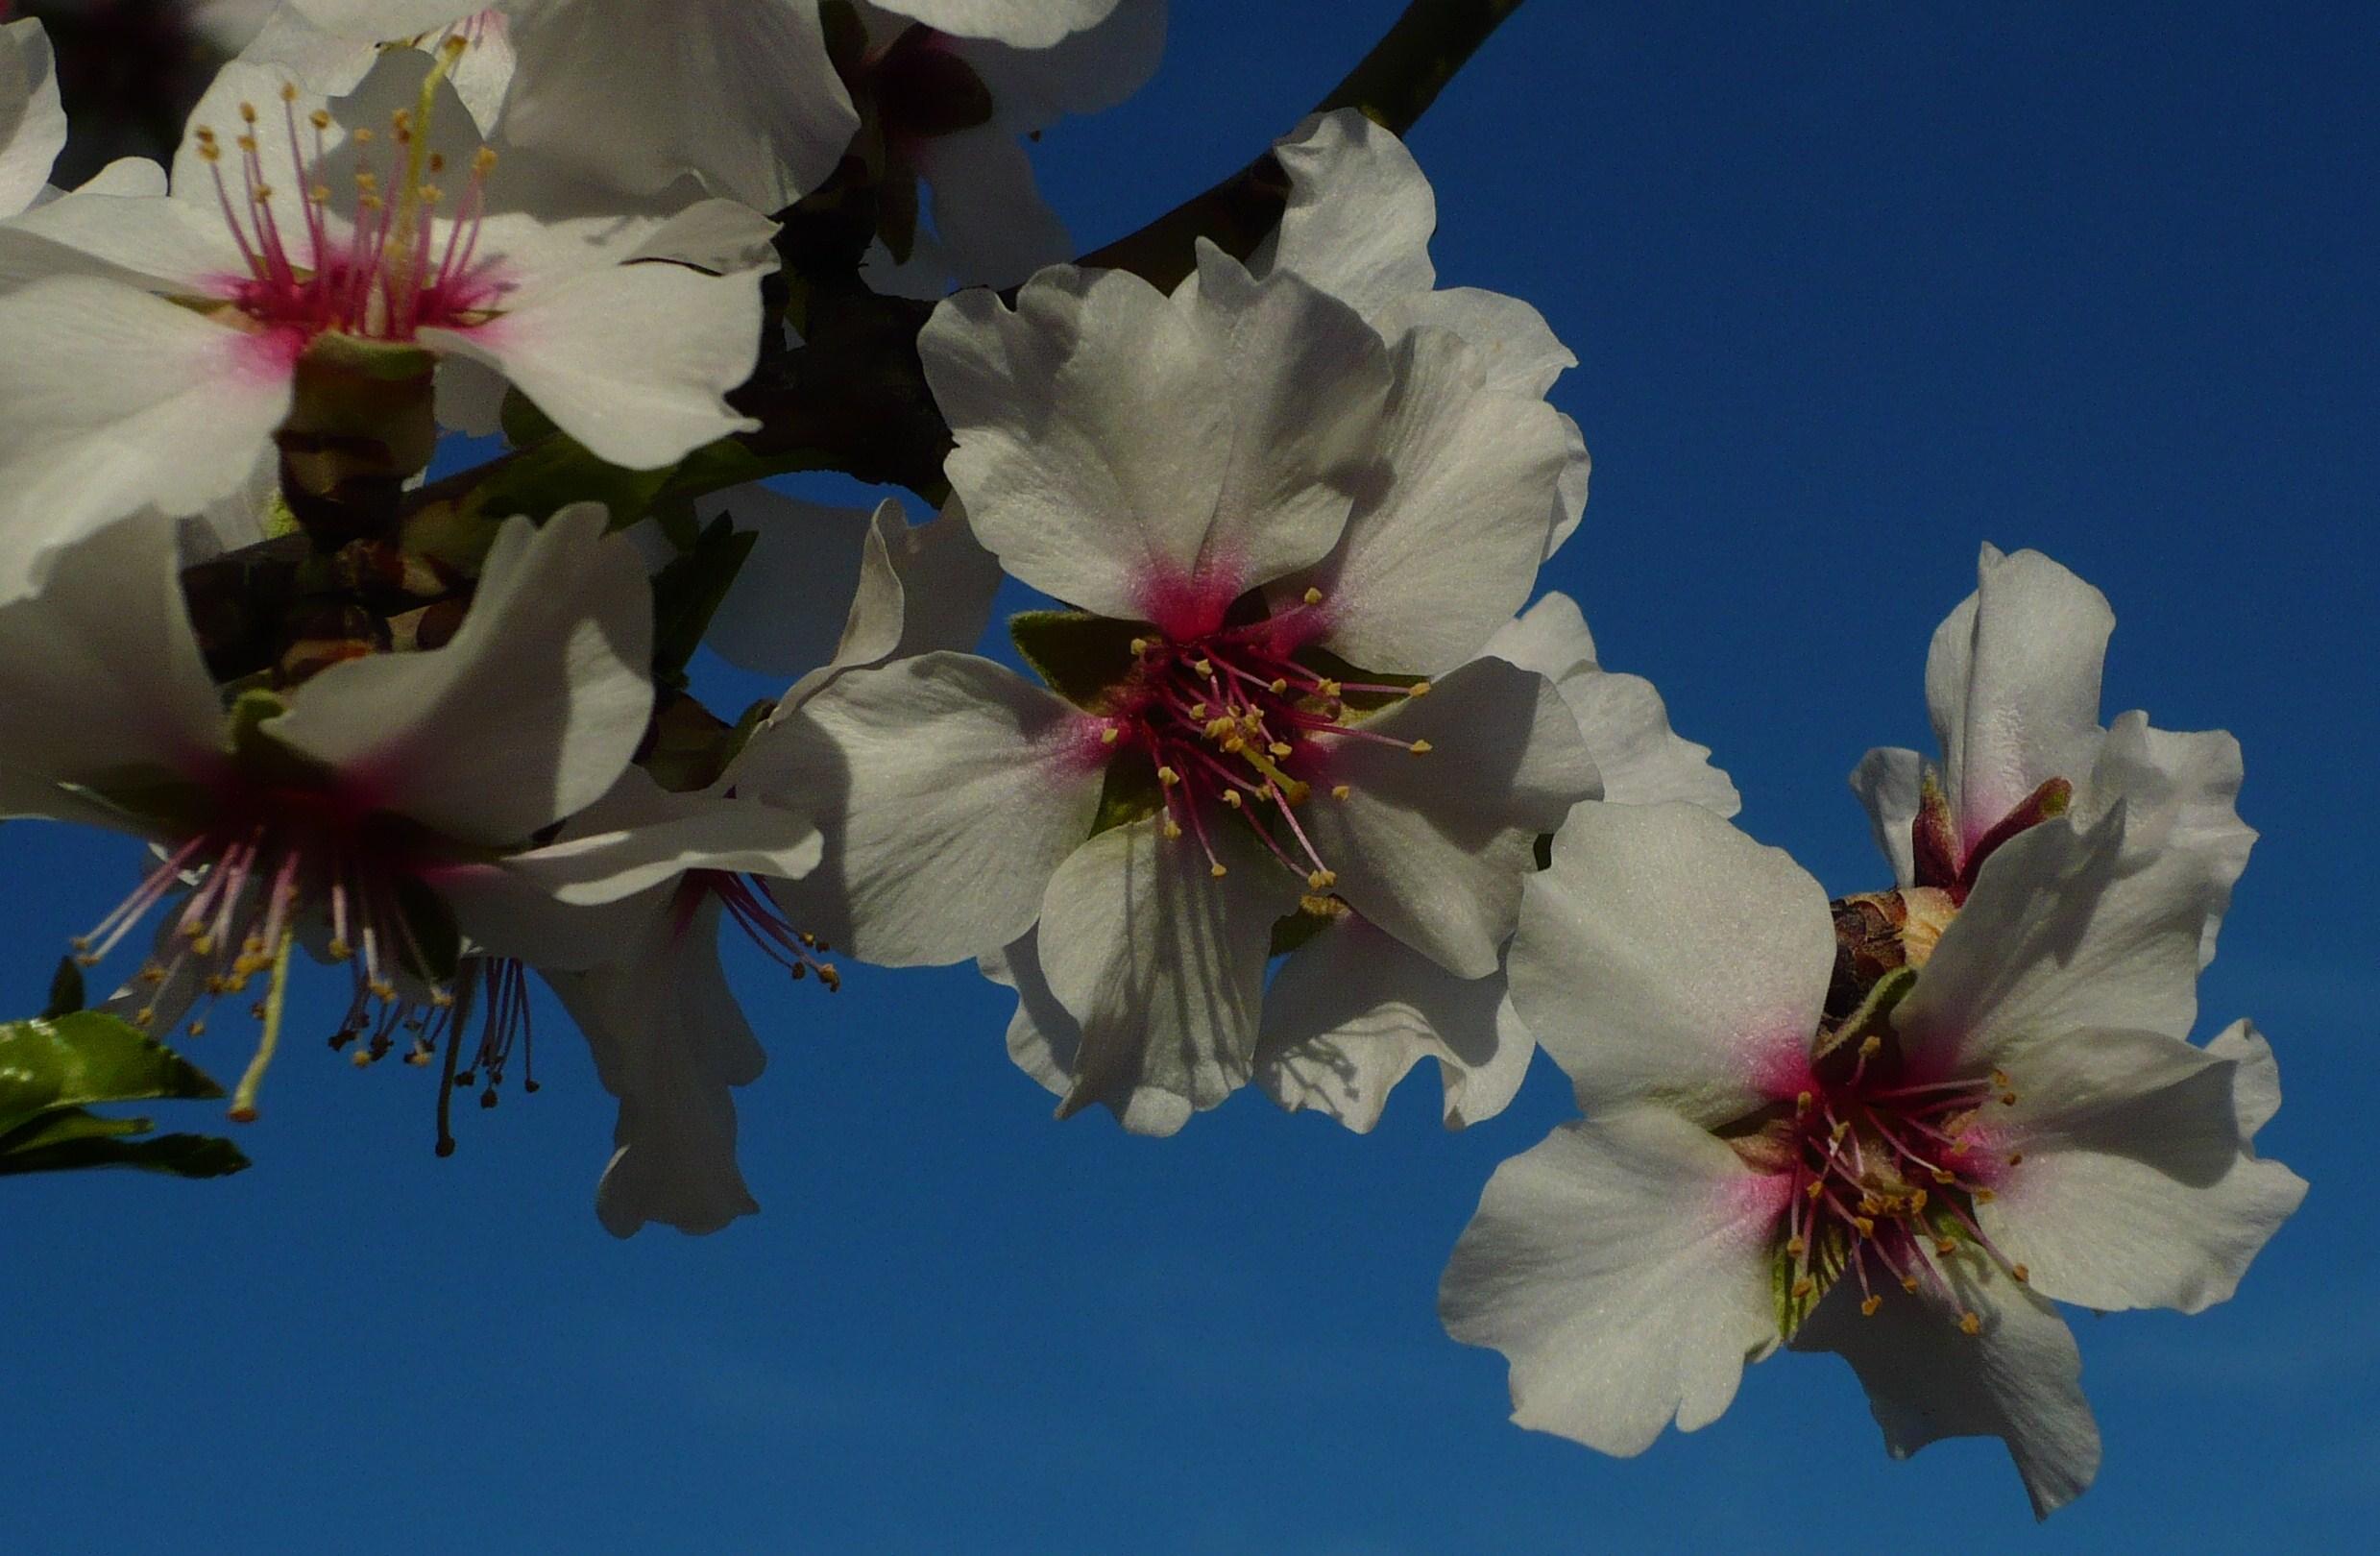 photo-recadree-de-fleurs-damandier.JPG